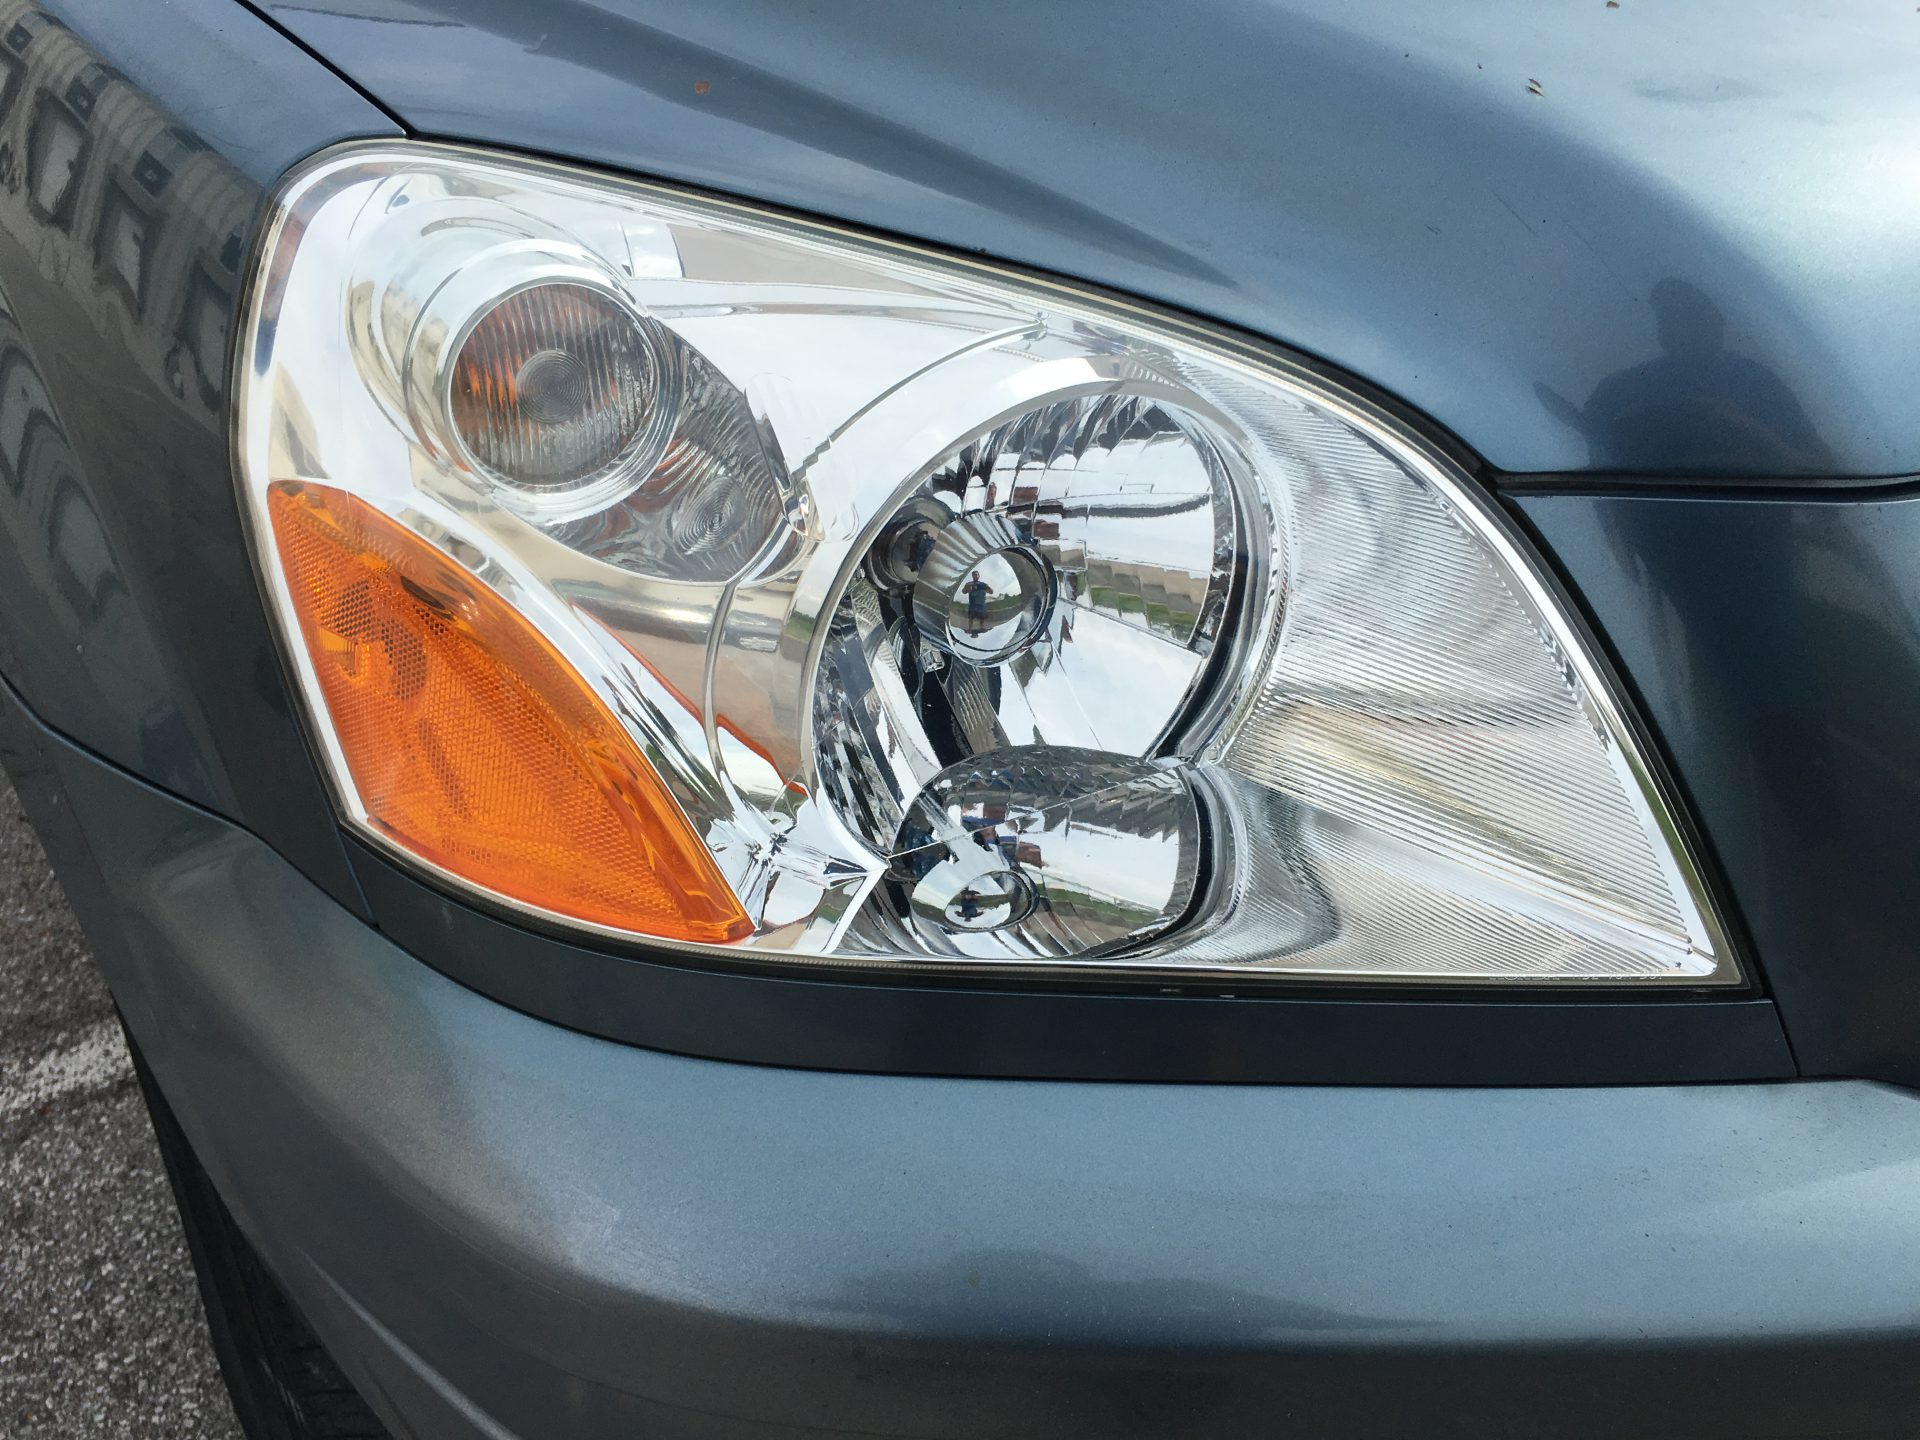 Honda CRV Passenger Headlight